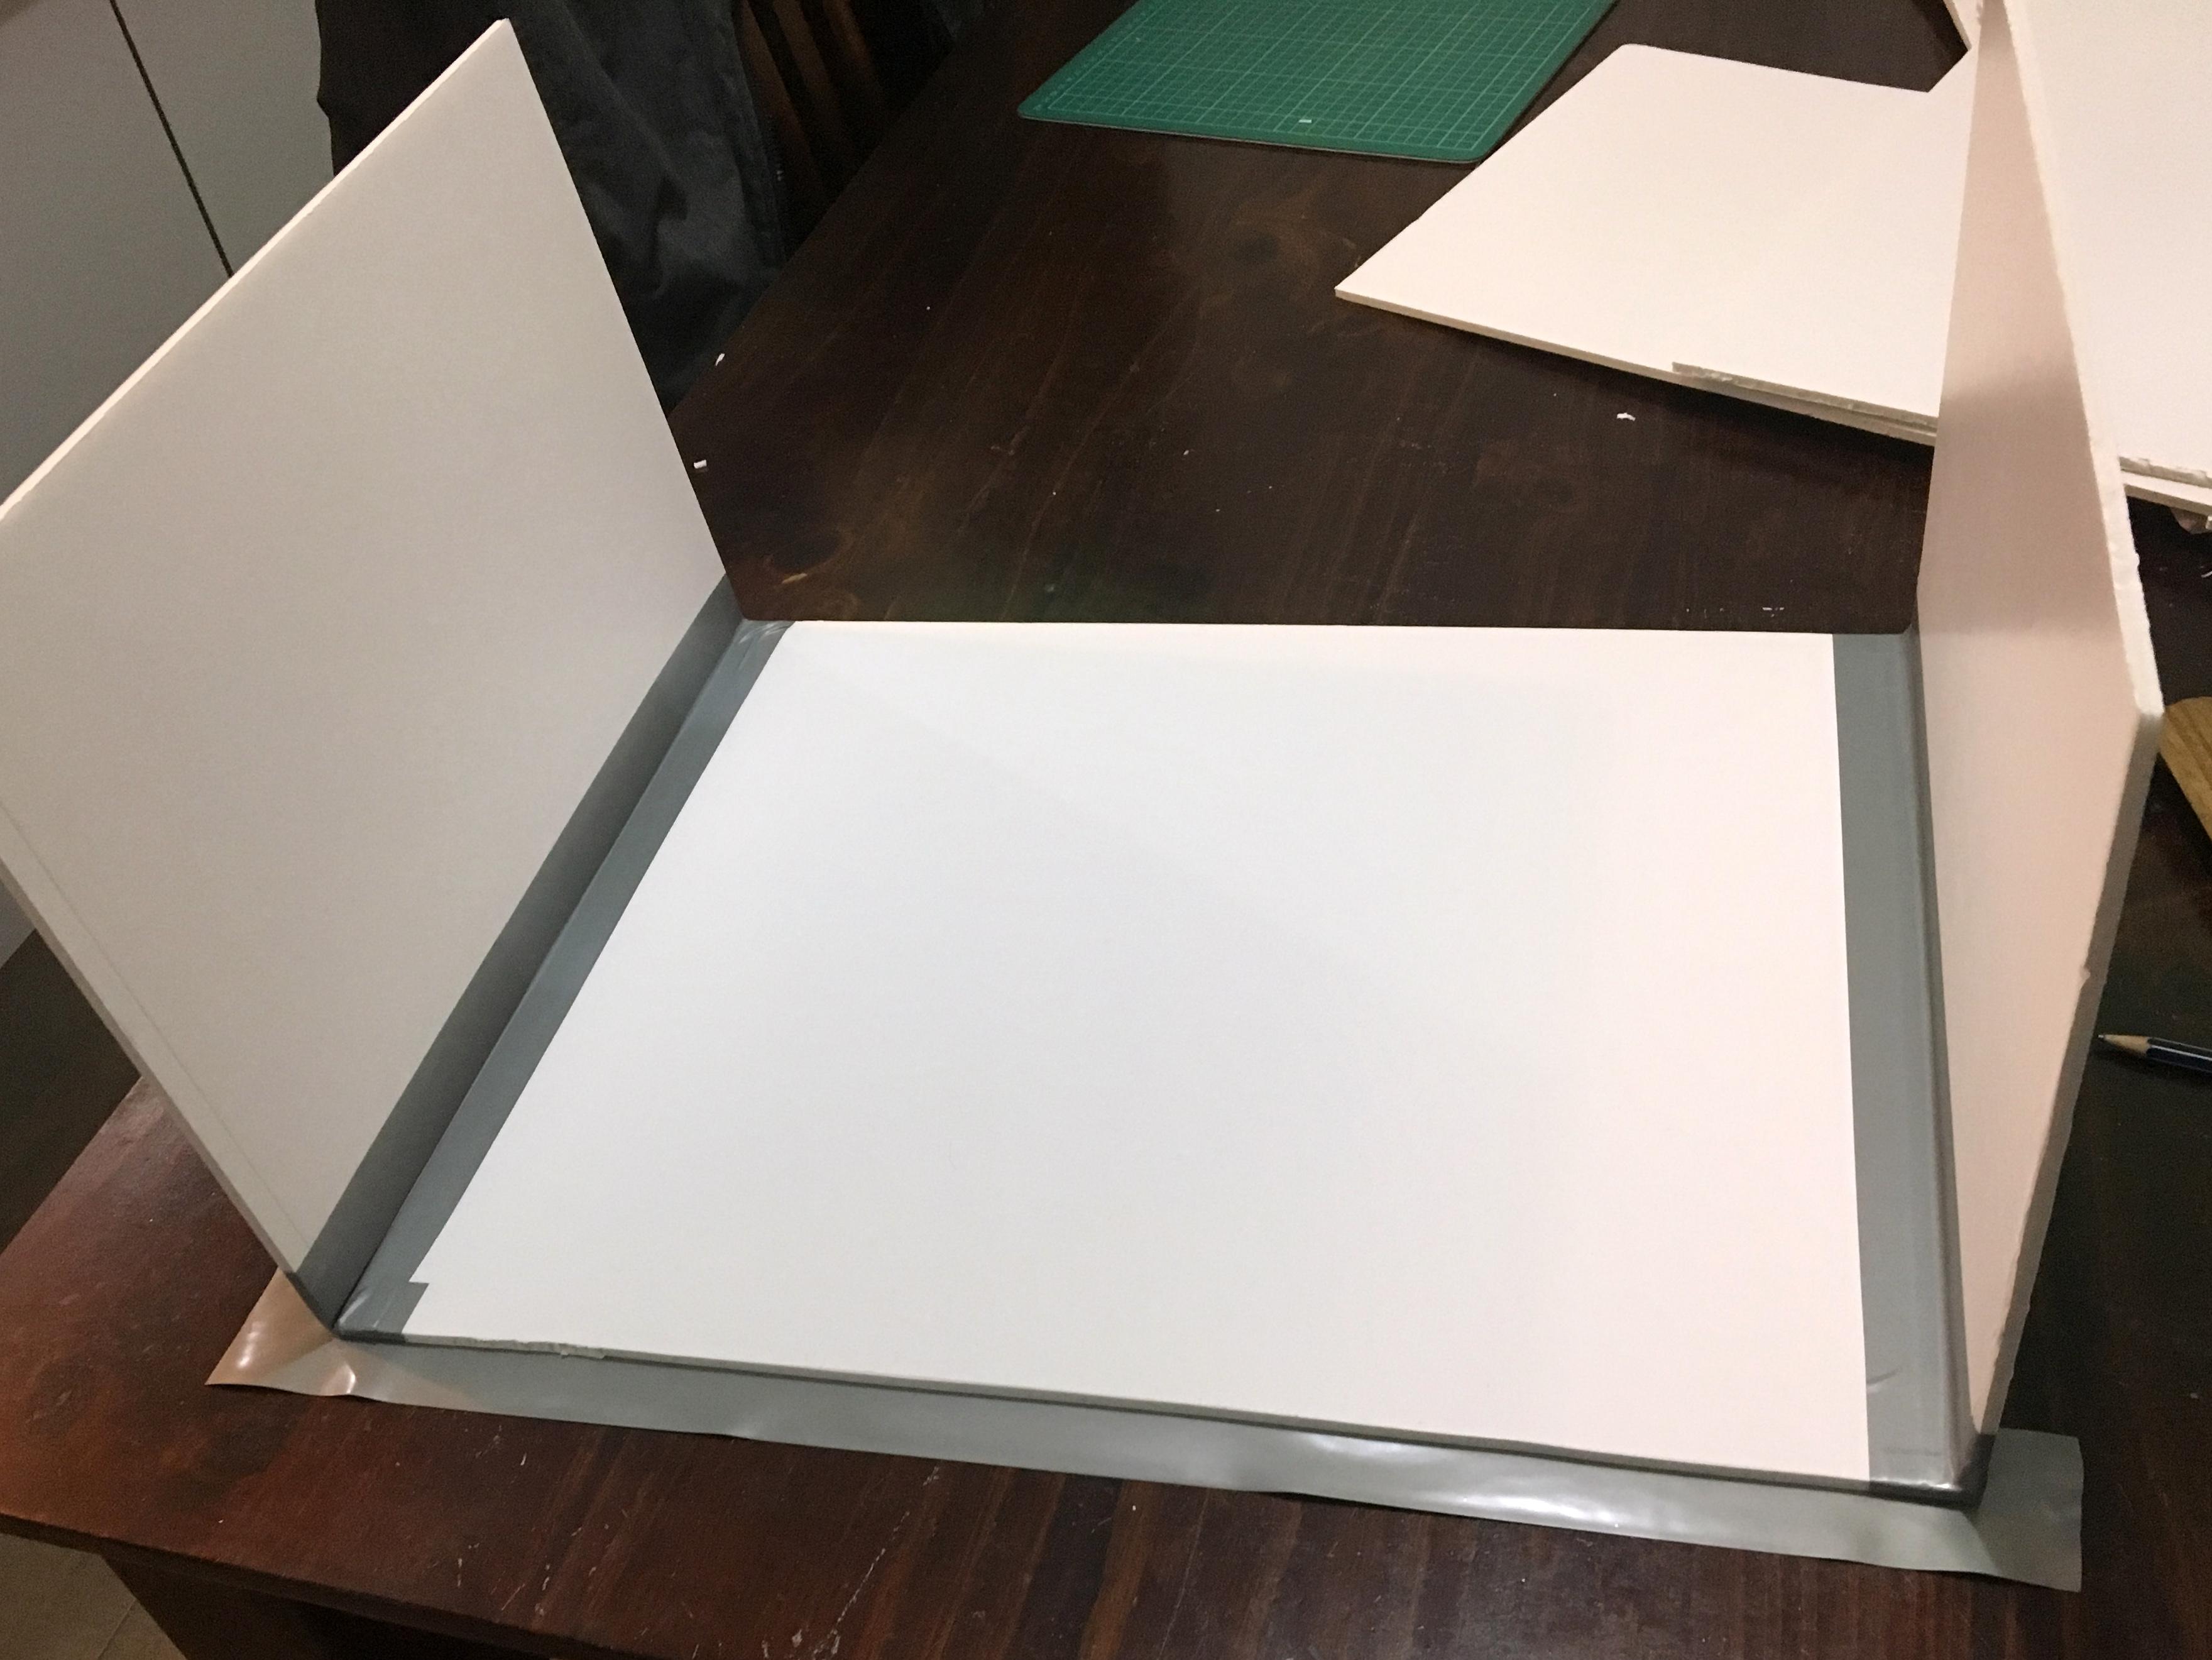 Storage Boxes DIY Step 2-b